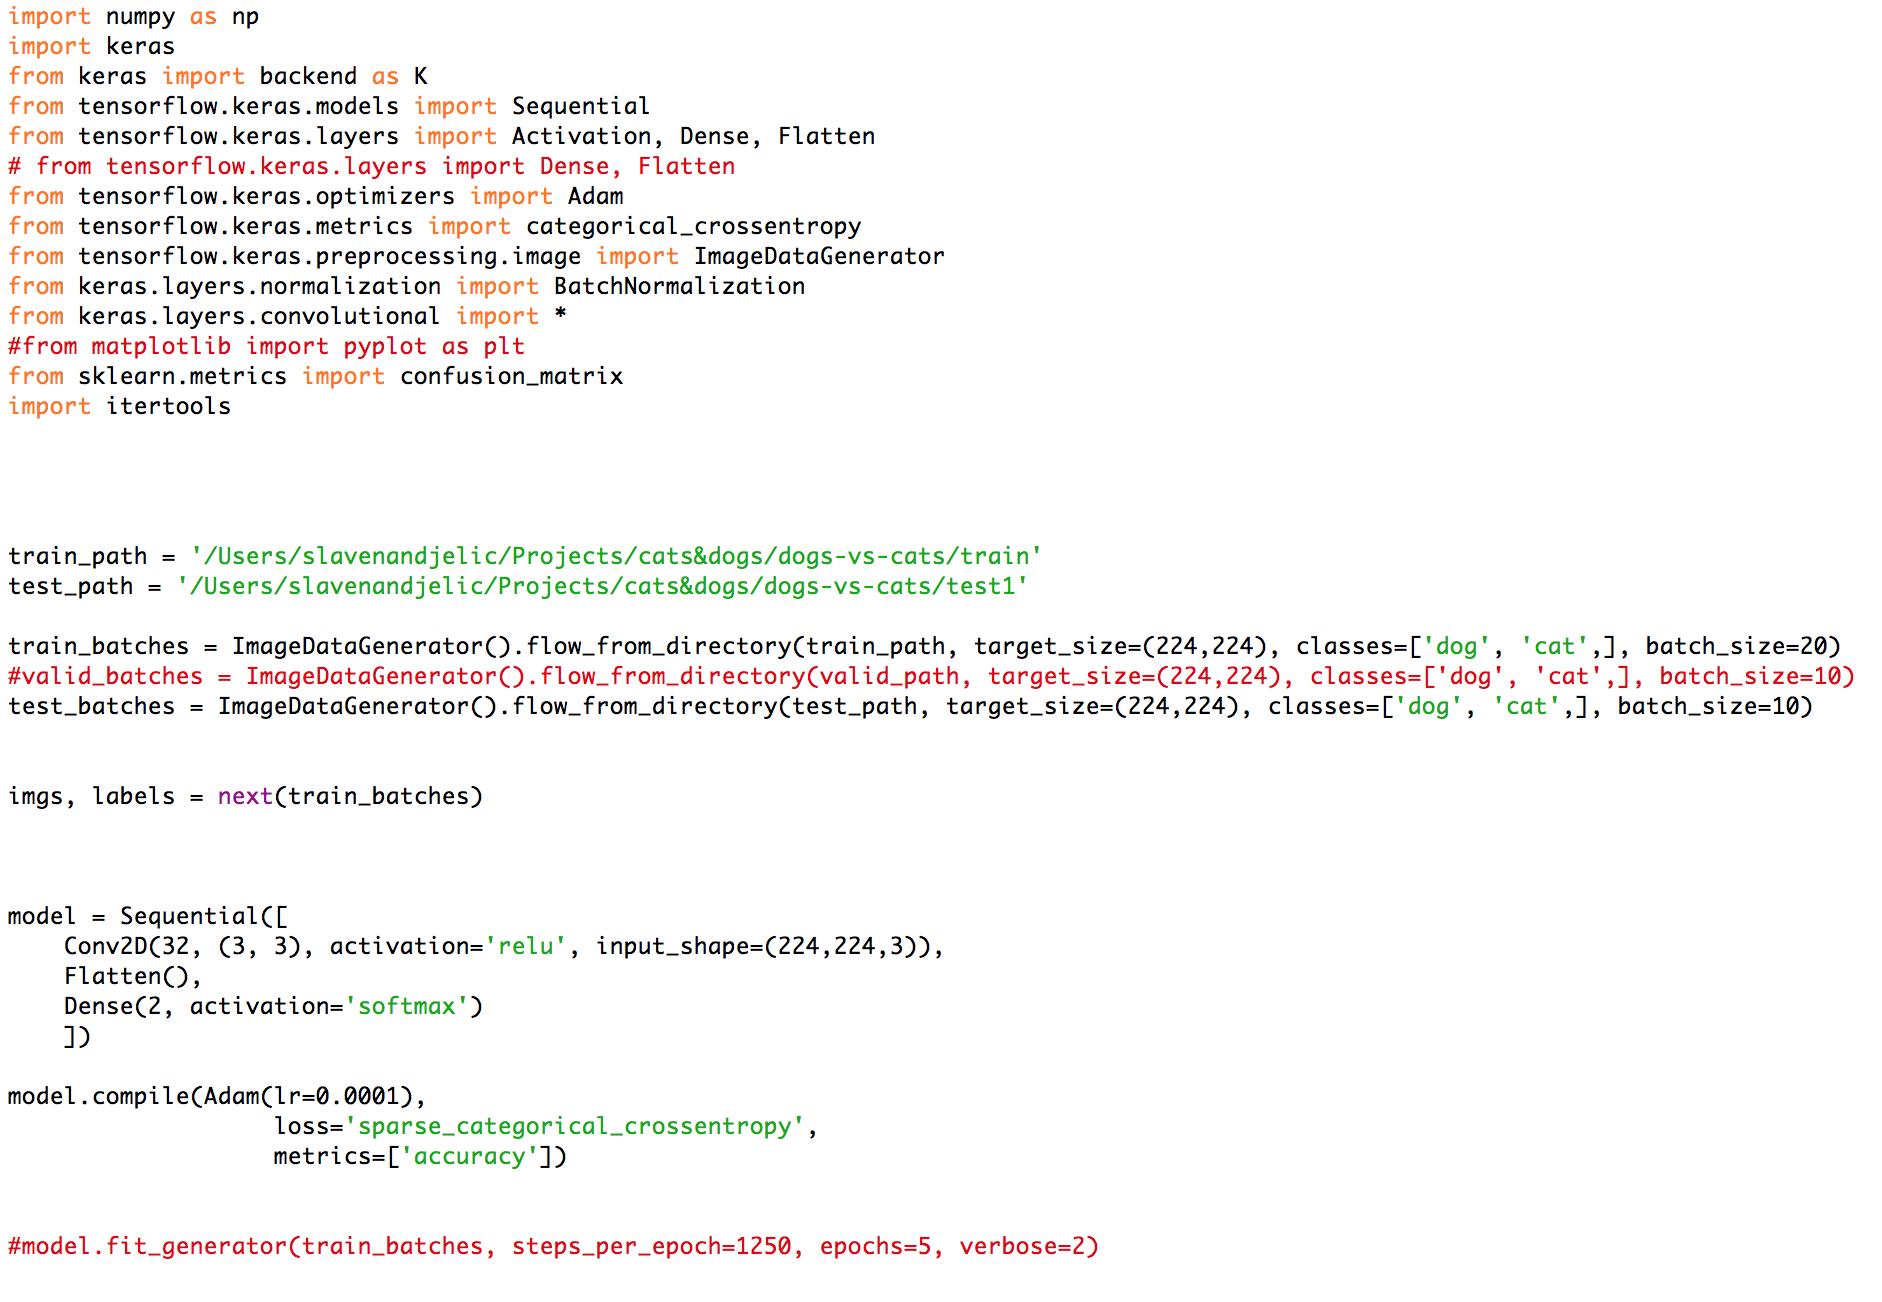 AttributeError: module 'tensorflow' has no attribute